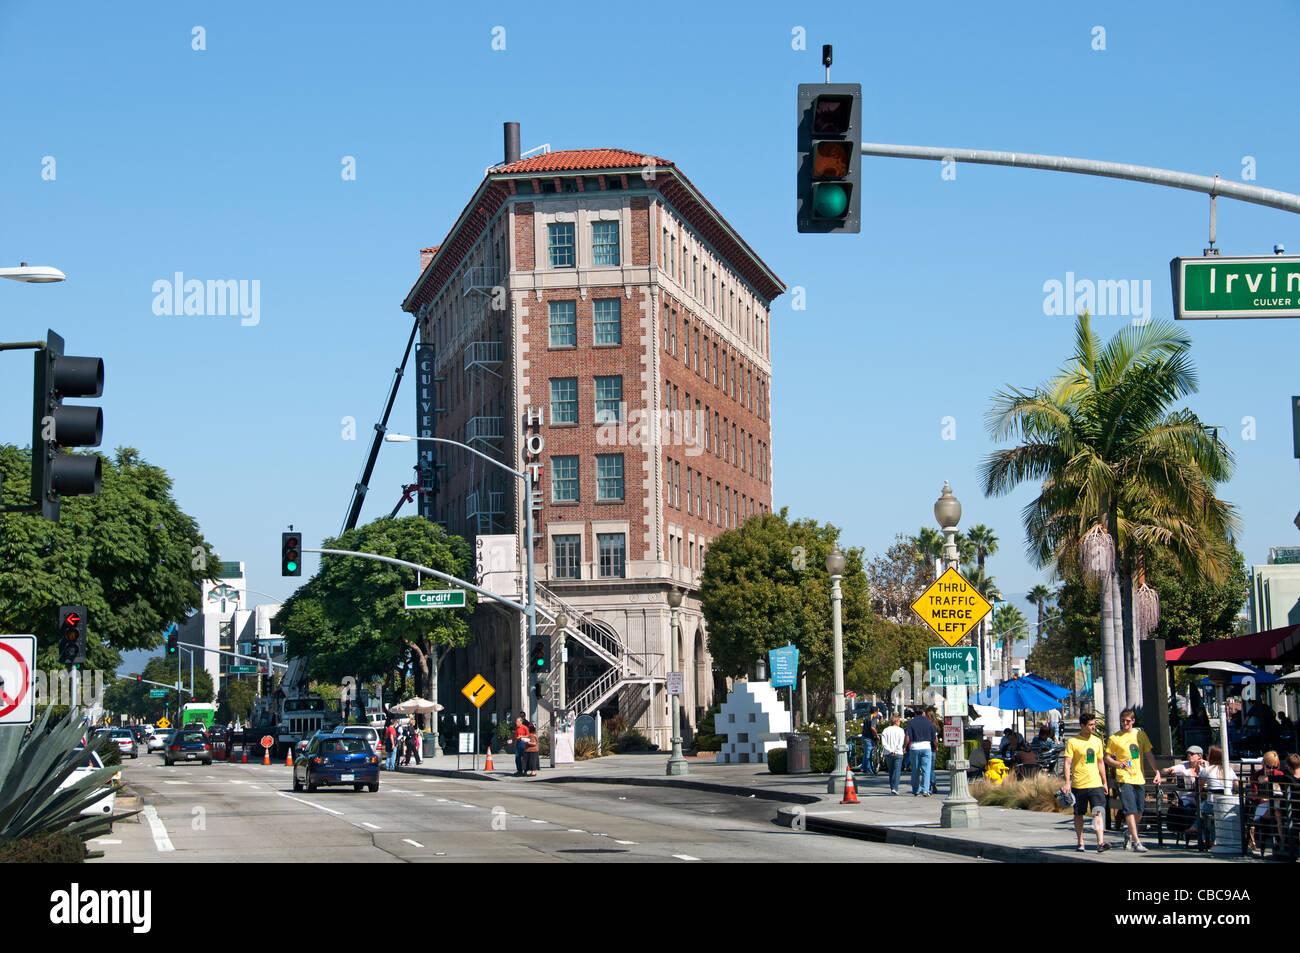 culver city hotel flatiron building california united. Black Bedroom Furniture Sets. Home Design Ideas